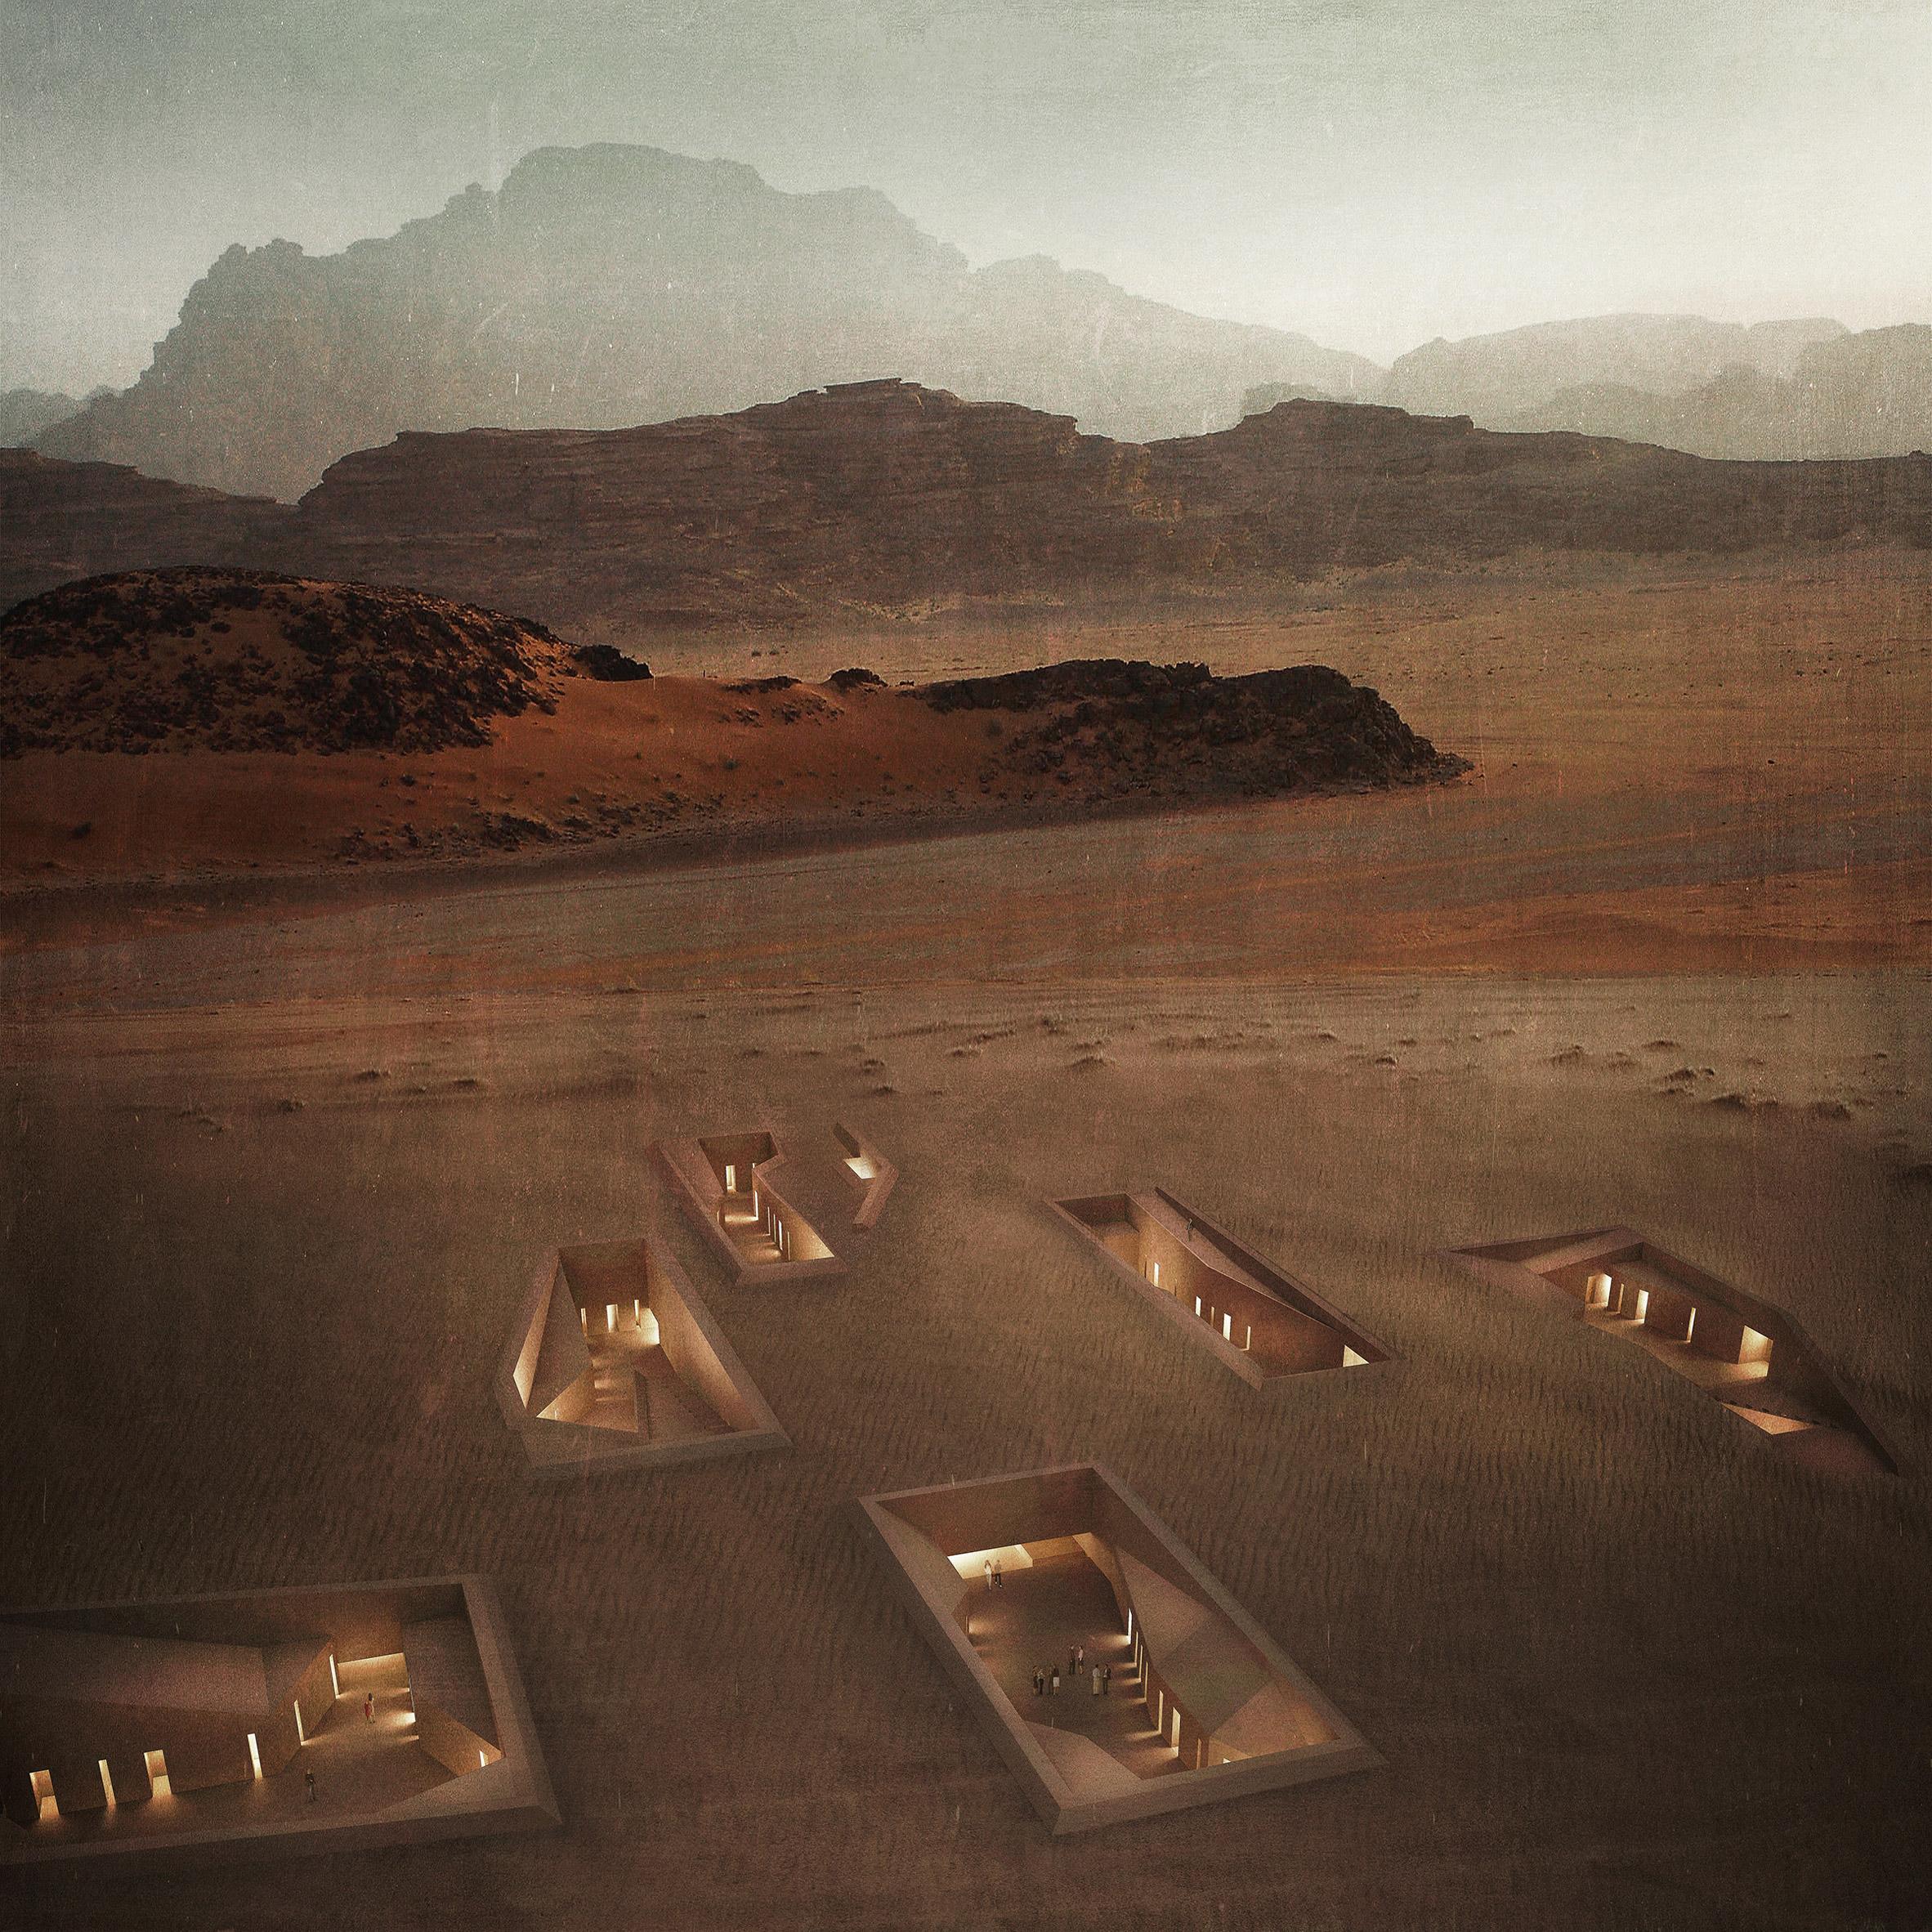 Rasem Kamal proposes warren of subterranean services for Jordan's Wadi Rum